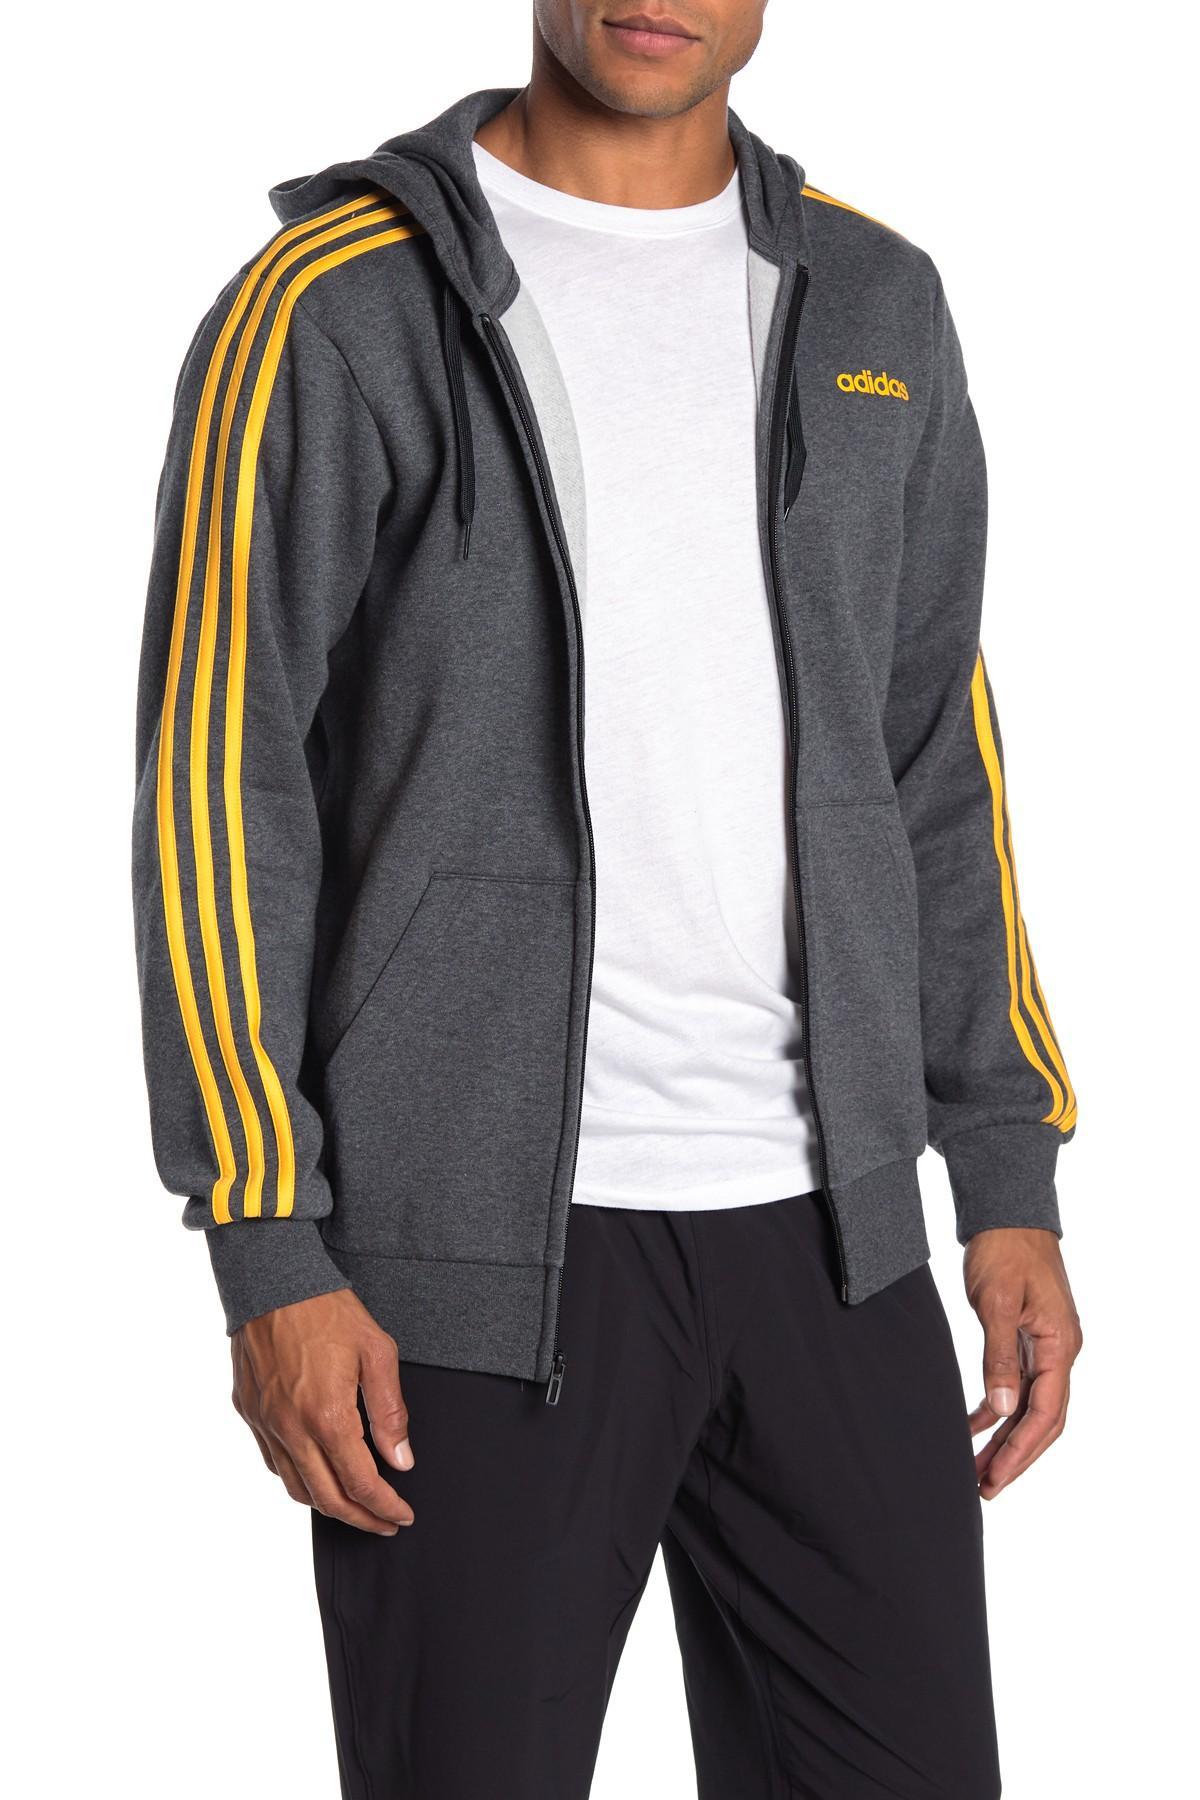 adidas Mens Essentials 3 Stripe Tall Sweatshirt in Grey Navy